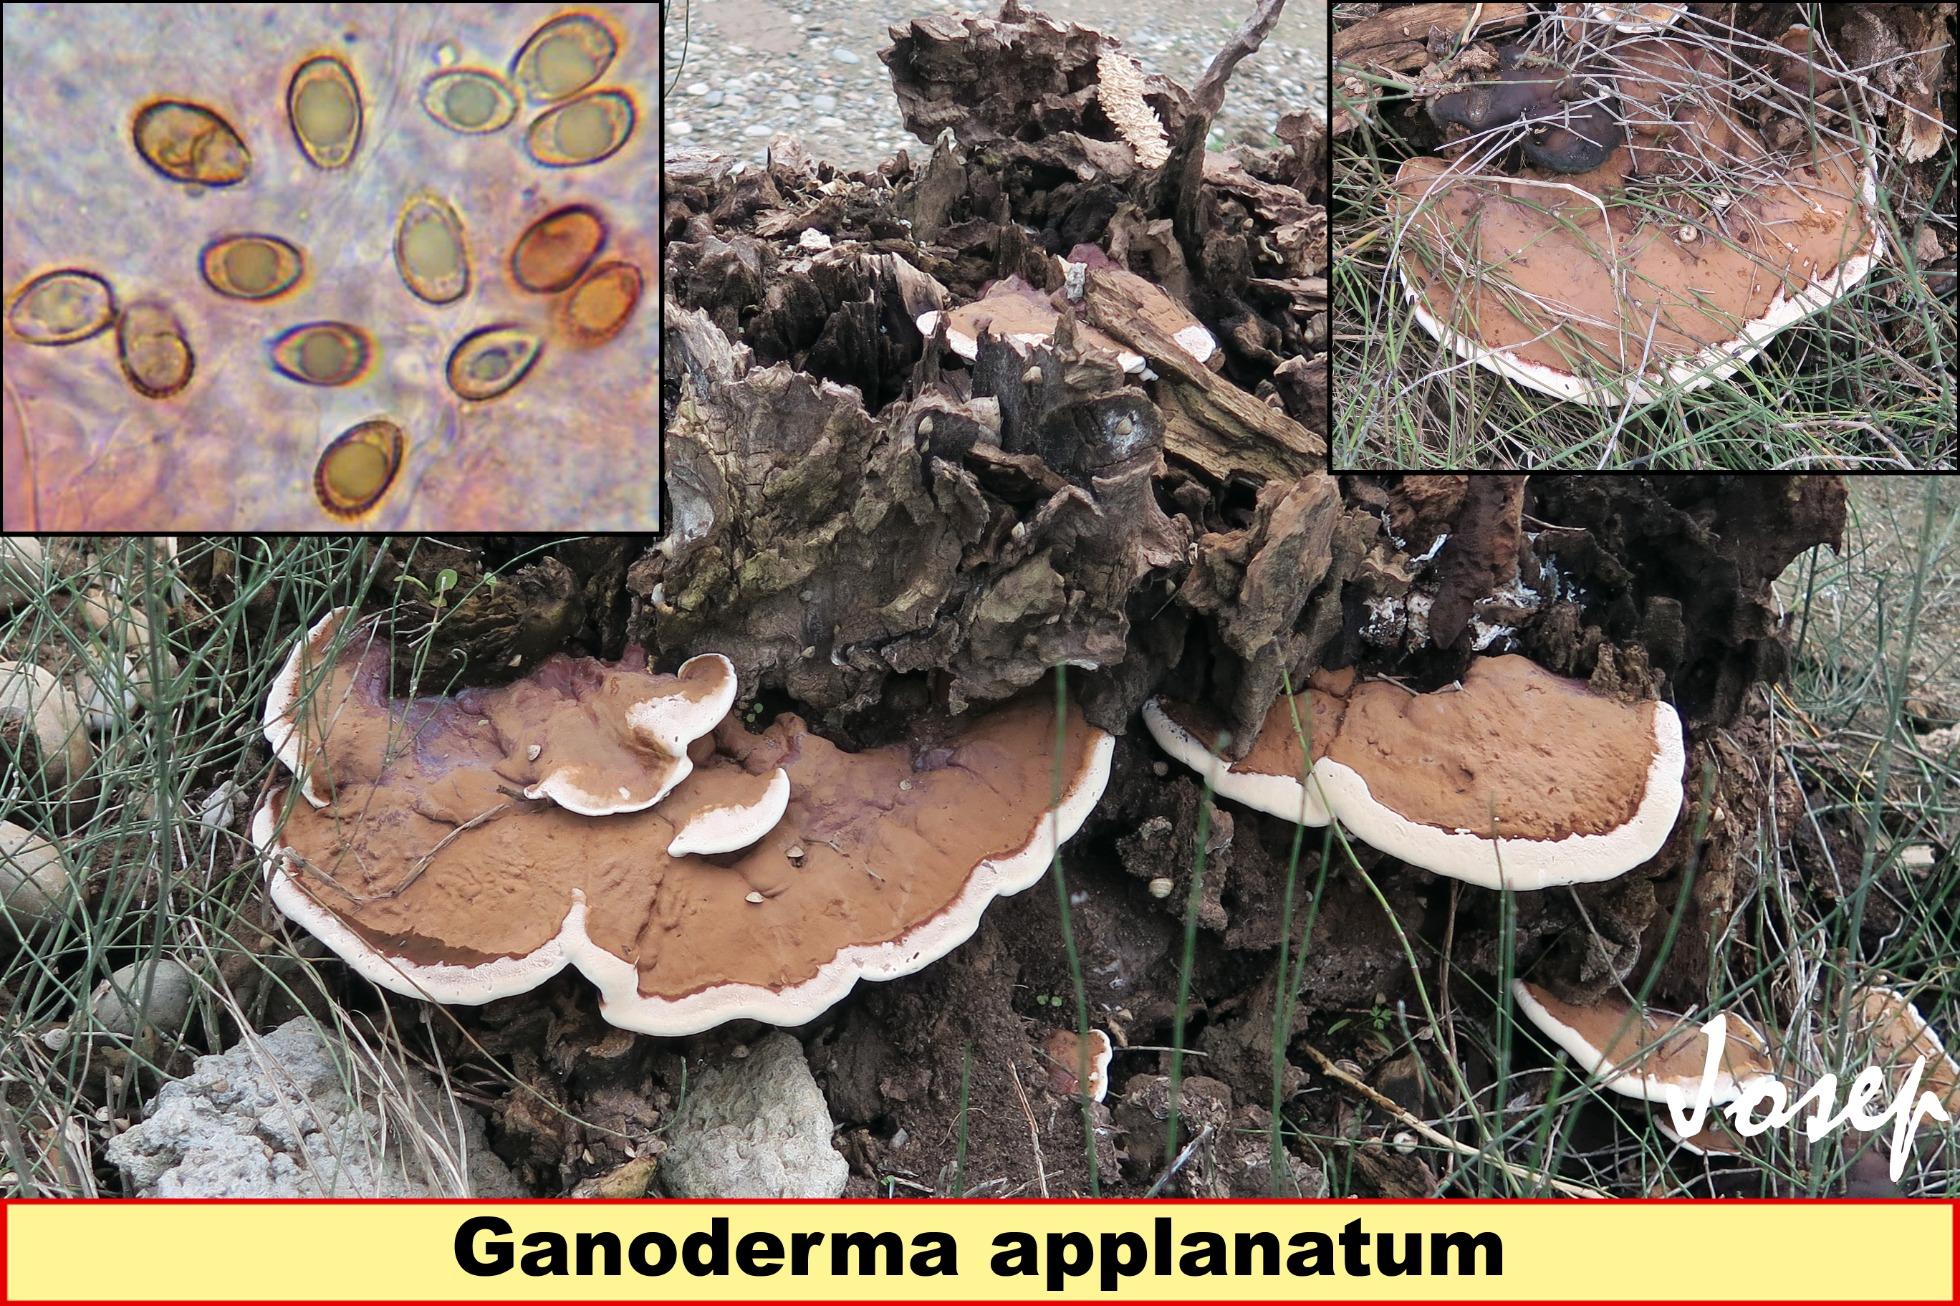 Ganodermaapplanatum_2020-08-09.jpg